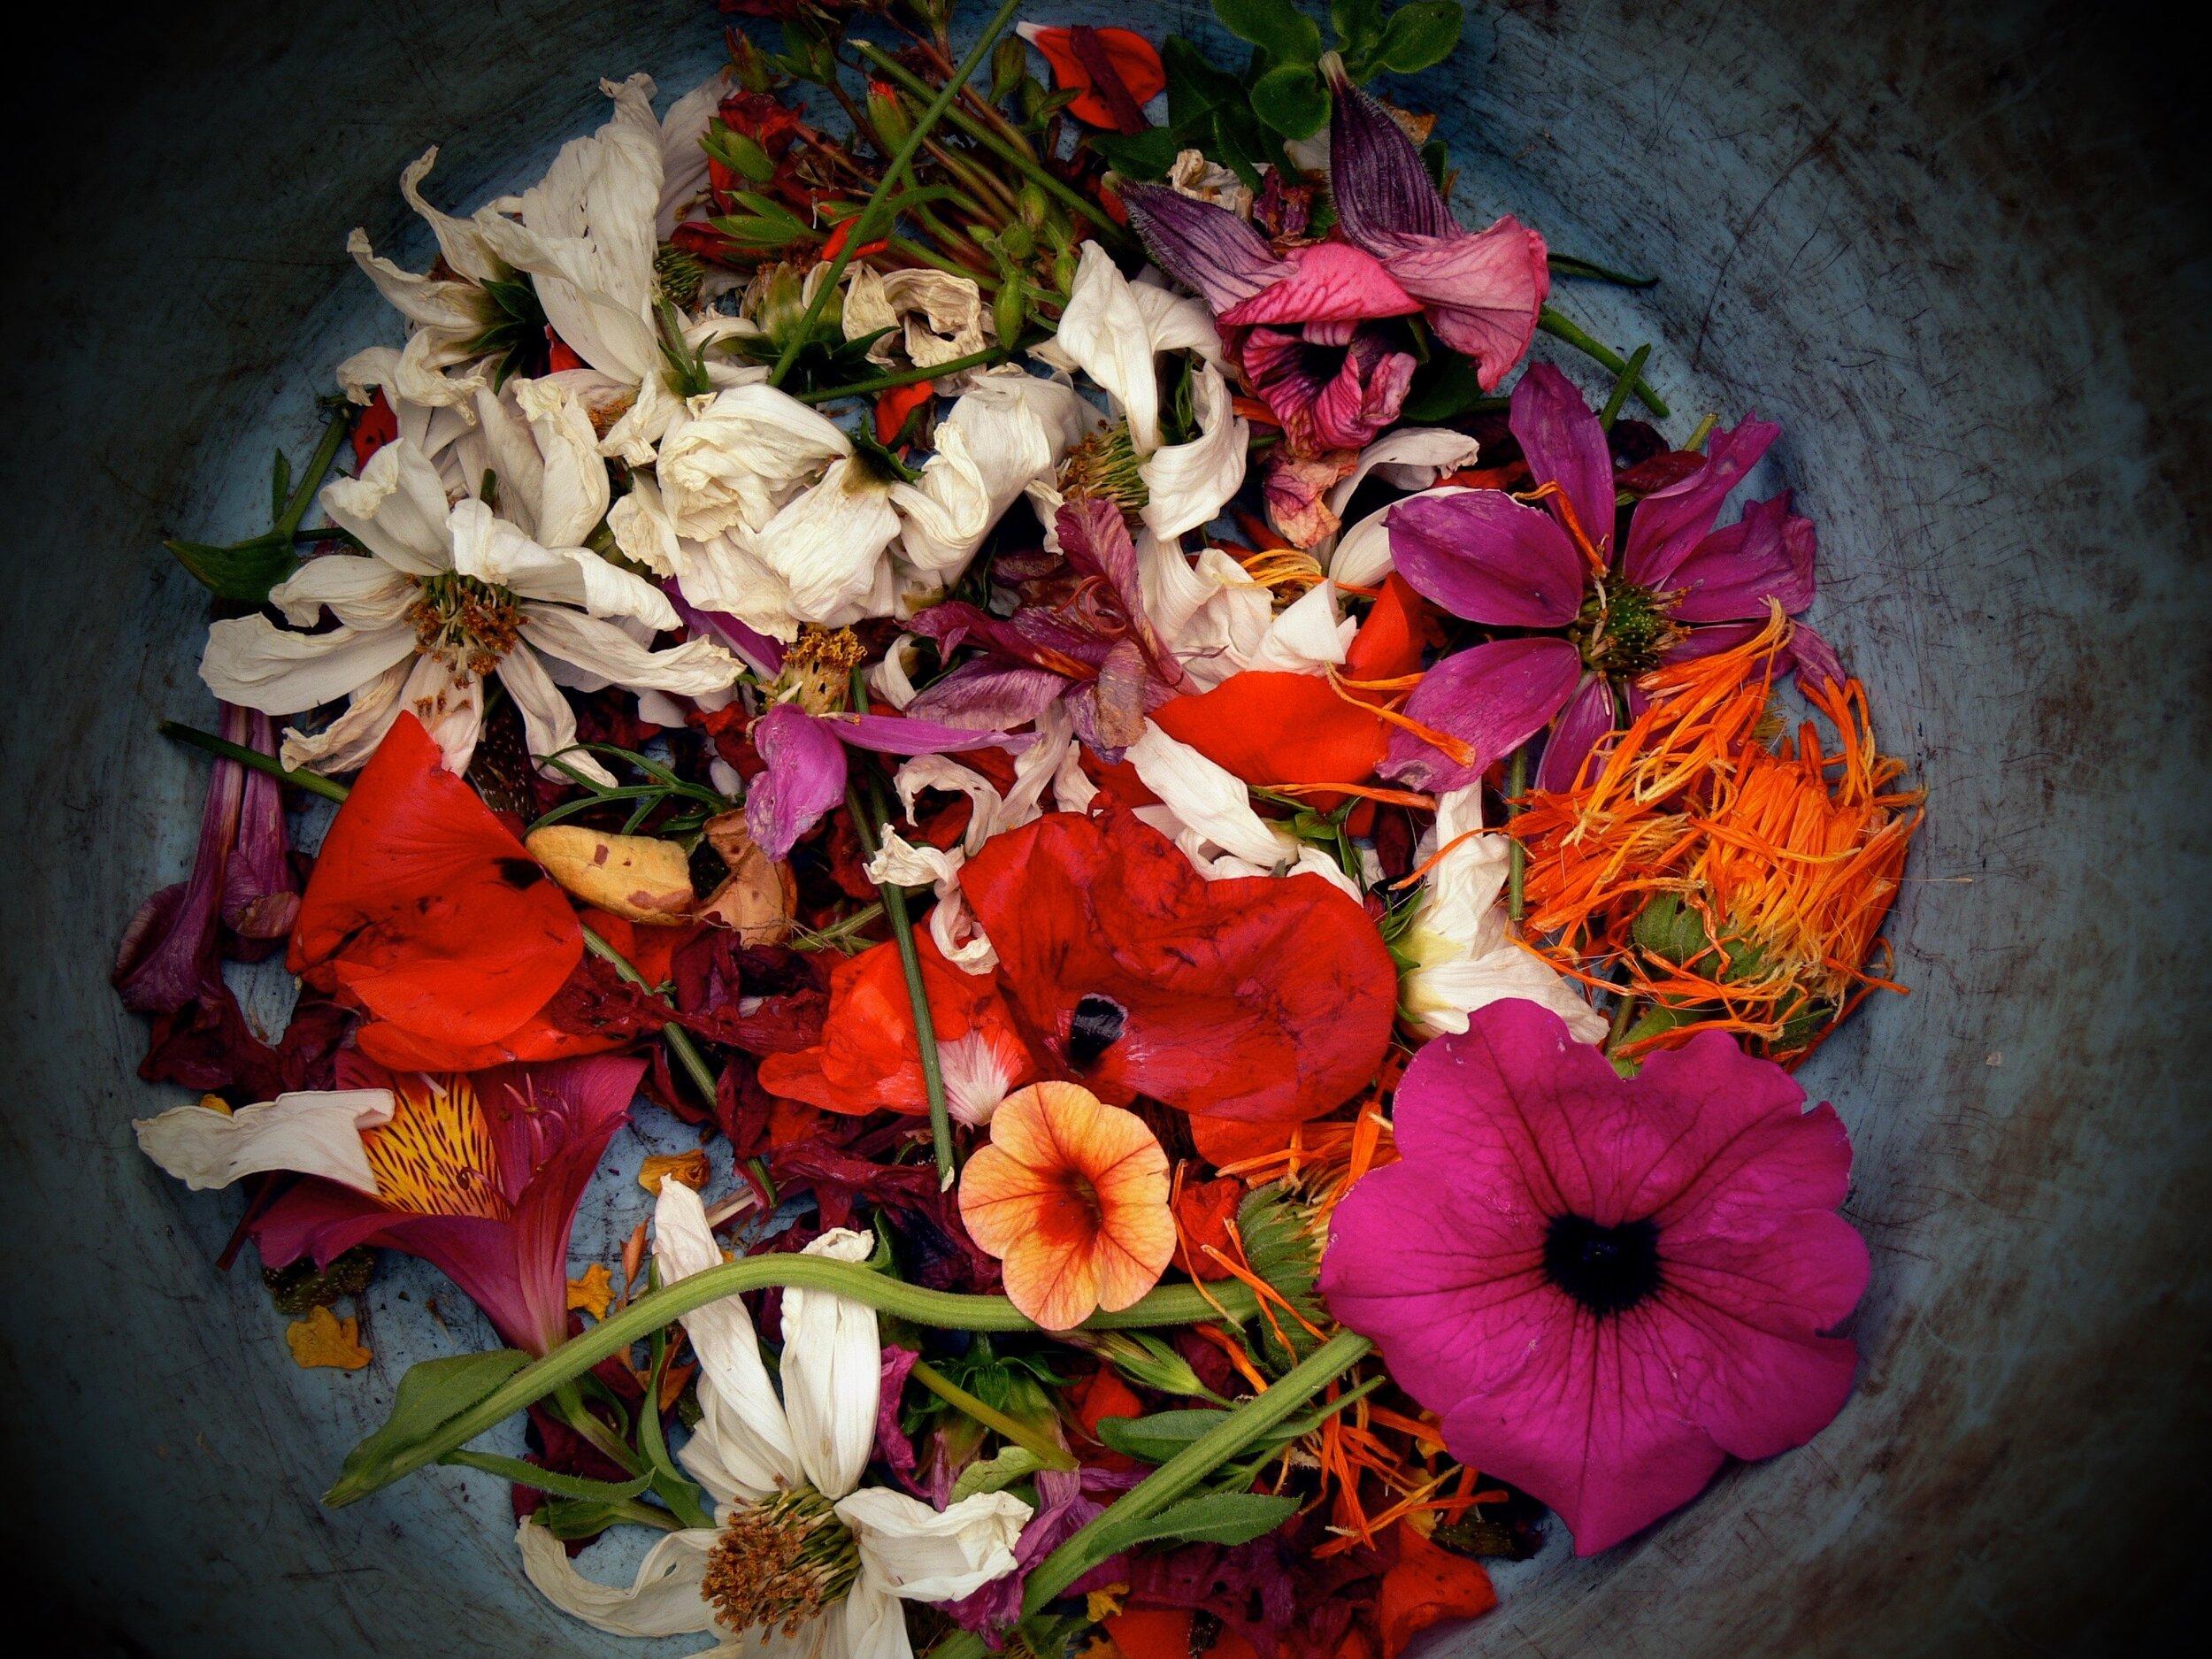 Dying flowers.jpg